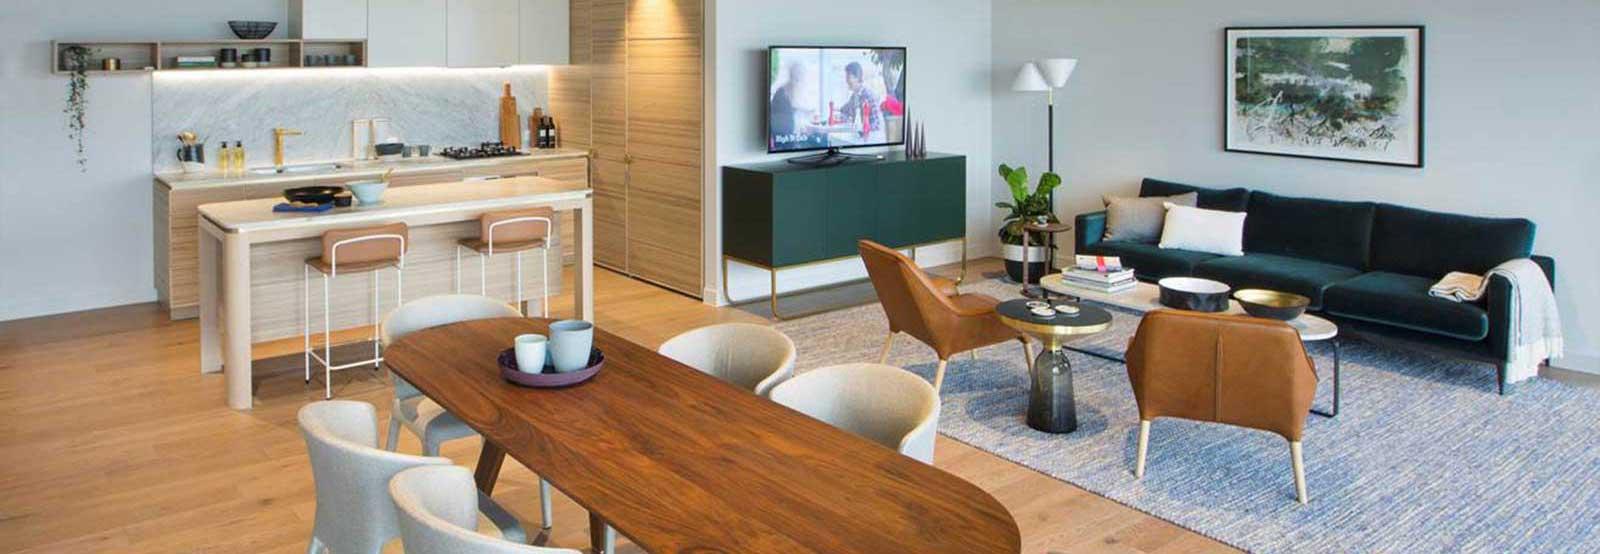 Caulfield Village – <span>Apartment Kitchen and Living</span>